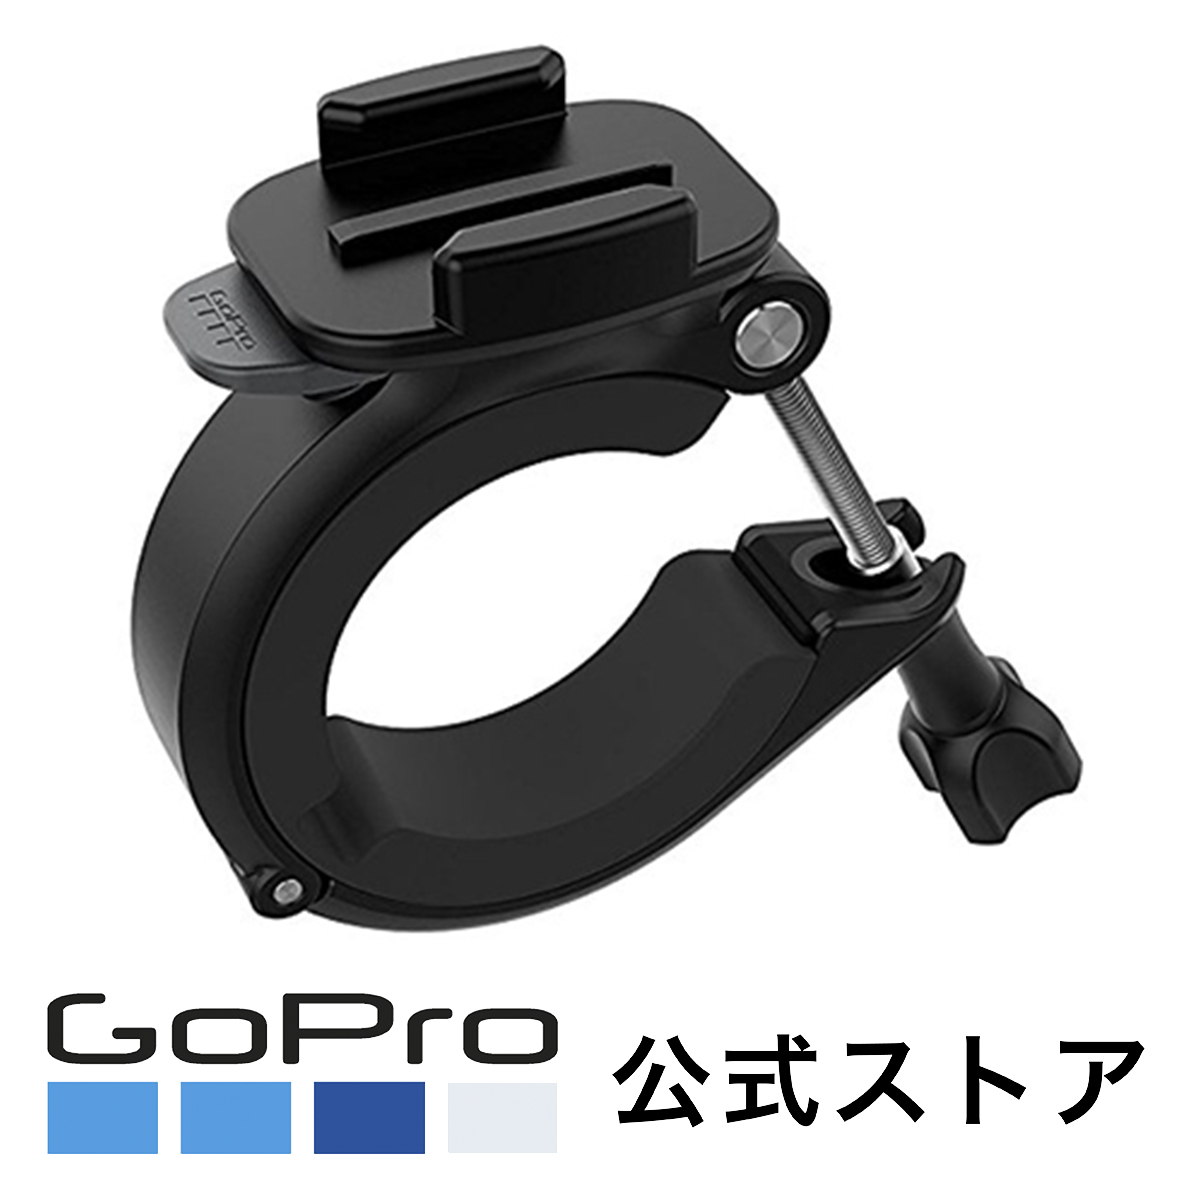 GoPro公式 格安店 日時指定 ゴープロ チューブマウント大 ロールバー 国内正規品 パイプ その他のアクセサリー対応 AGTLM-001